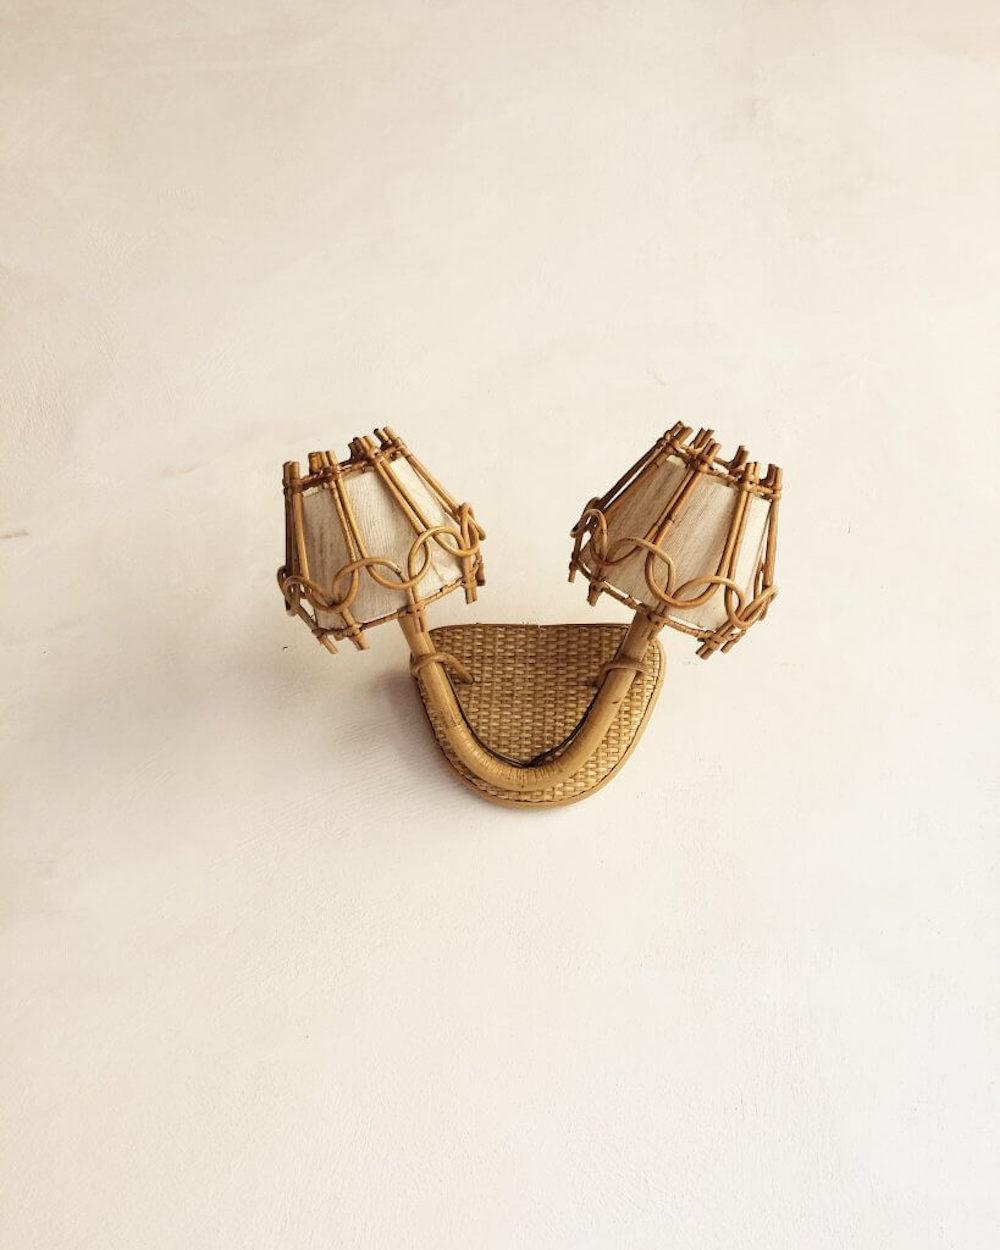 Applique en rotin, collection vintage, Atelier Vime